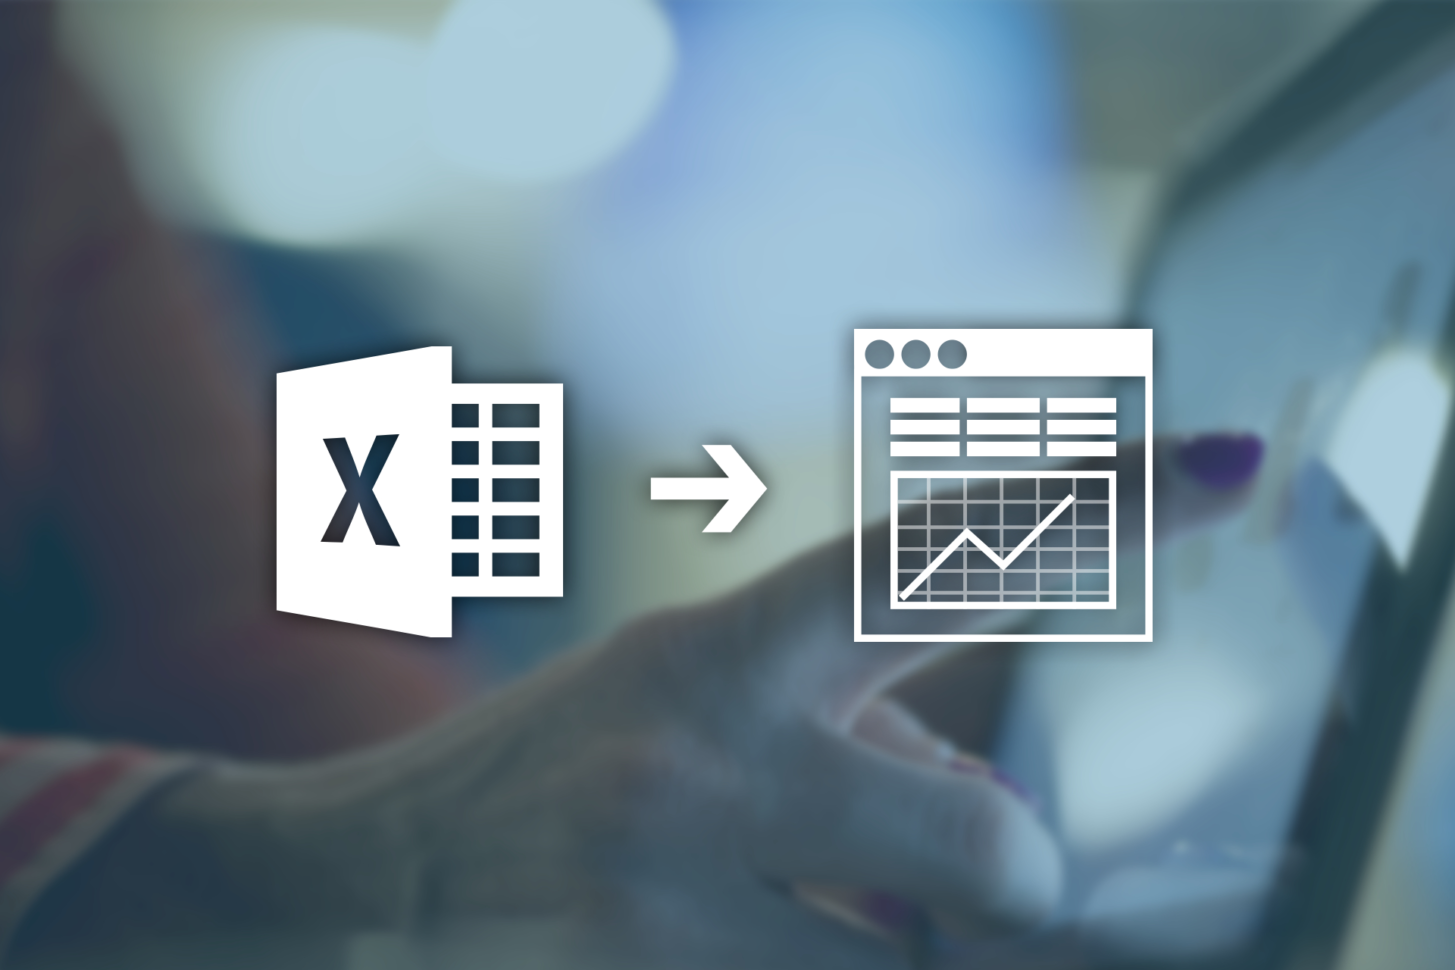 Convert Excel Spreadsheet To Access Database 2013 In Convert Excel Spreadsheets Into Web Database Applications  Caspio